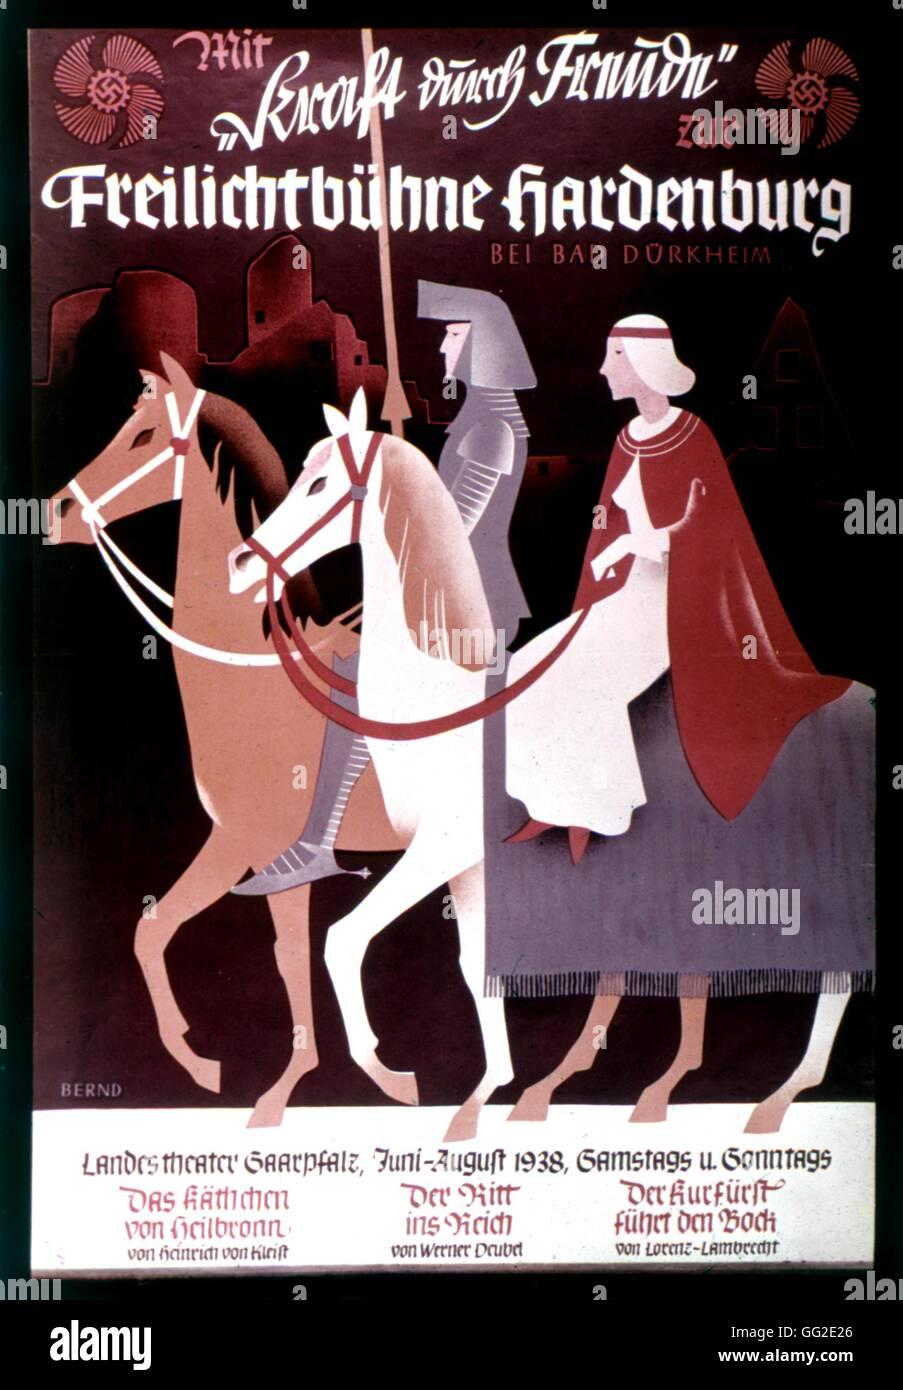 Propaganda poster Organization of leisures and Nazi propaganda 20th century Germany - Stock Image